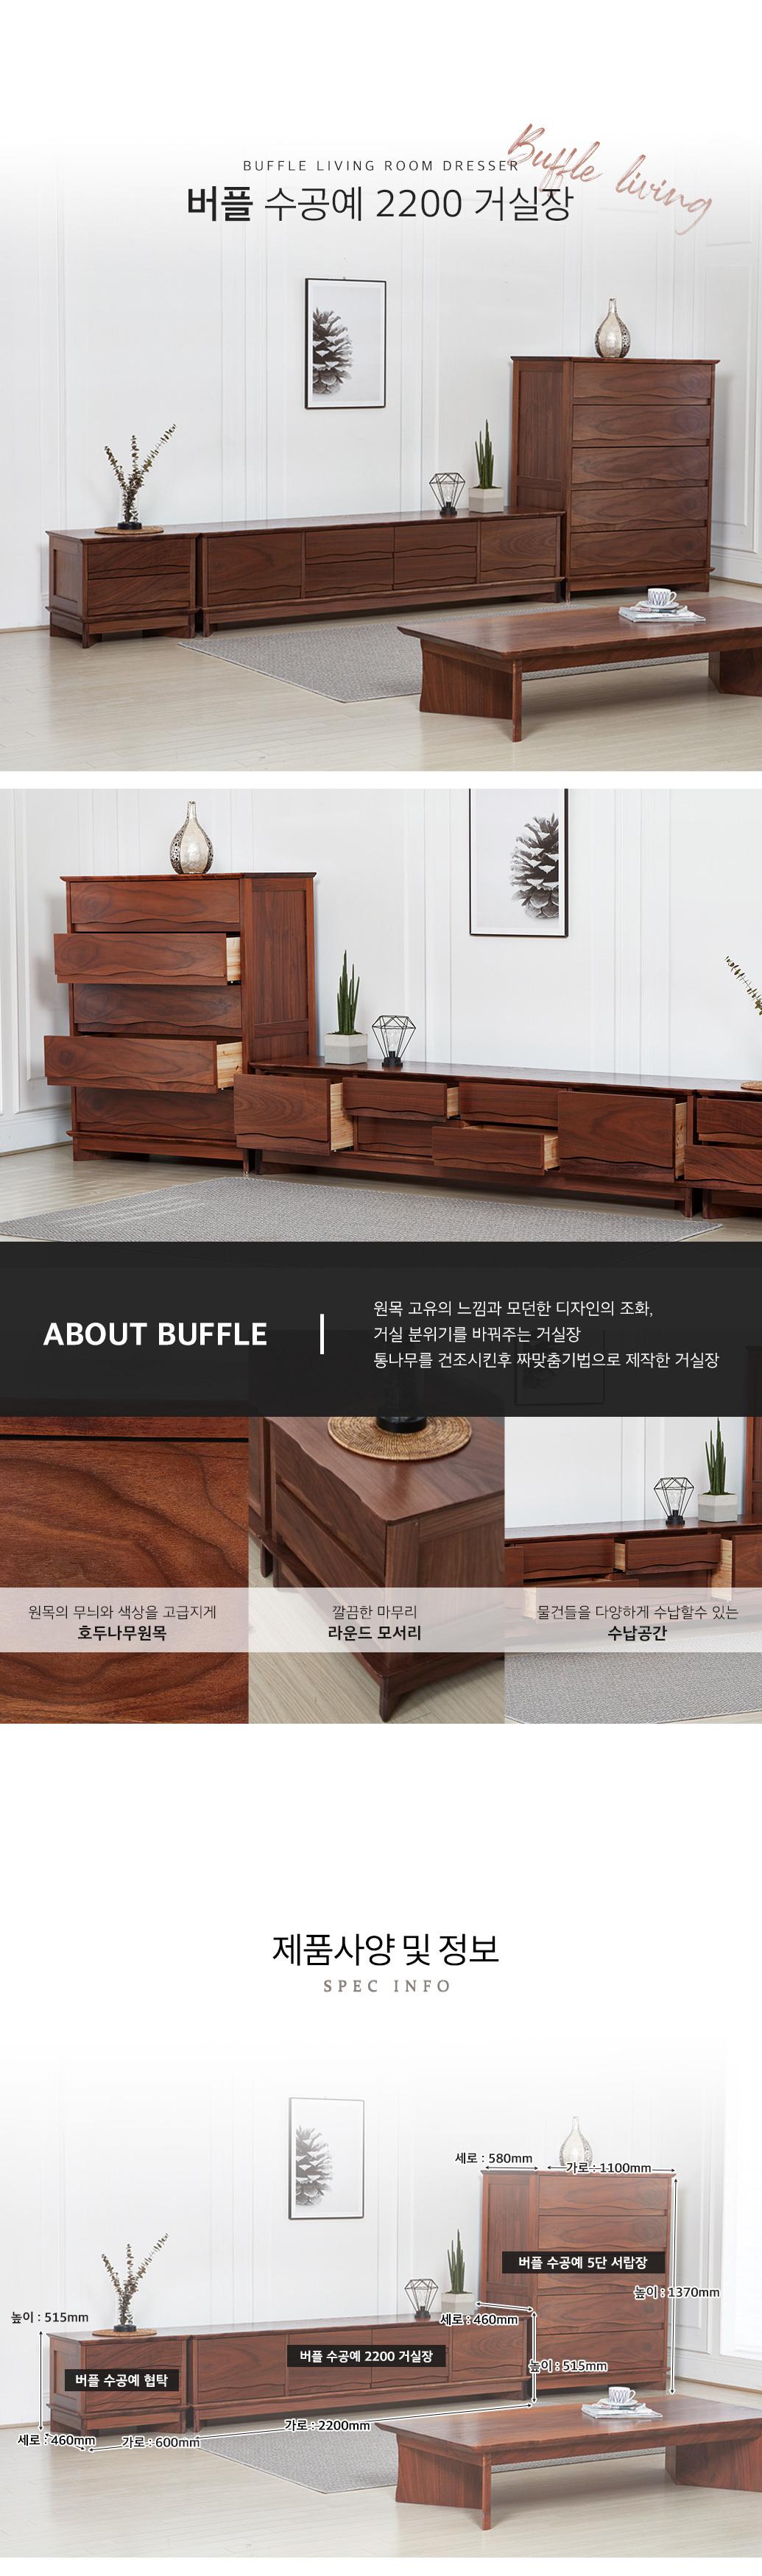 buffle_living_01.jpg